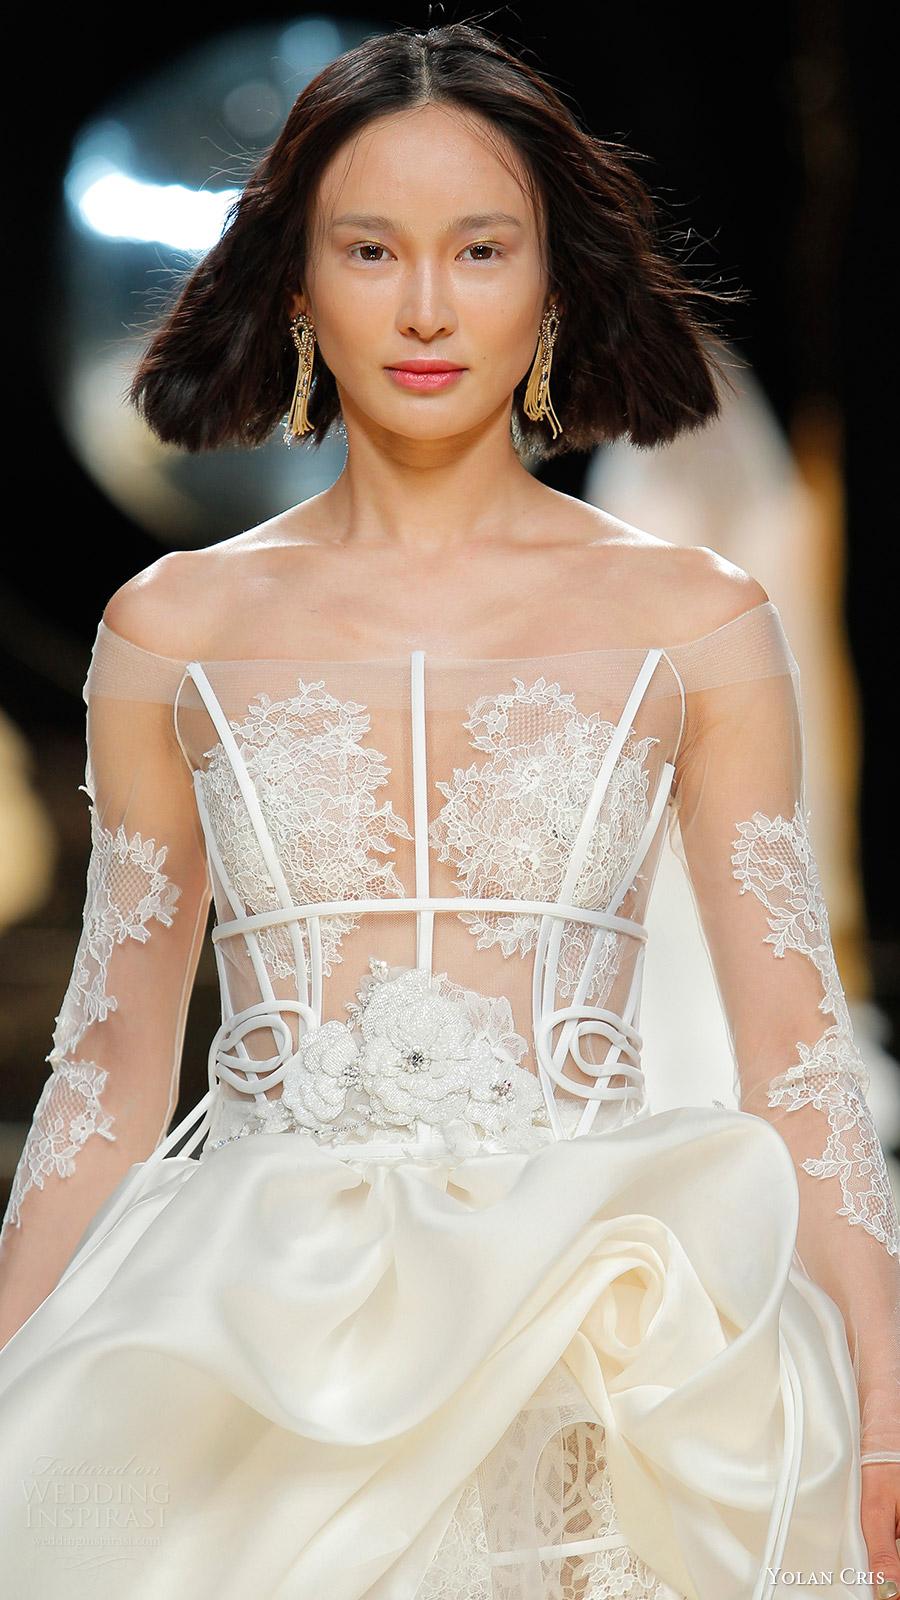 Yolancris Long Sleeve Wedding Dress : The yolan cris bridal wedding dresses from inspirasi